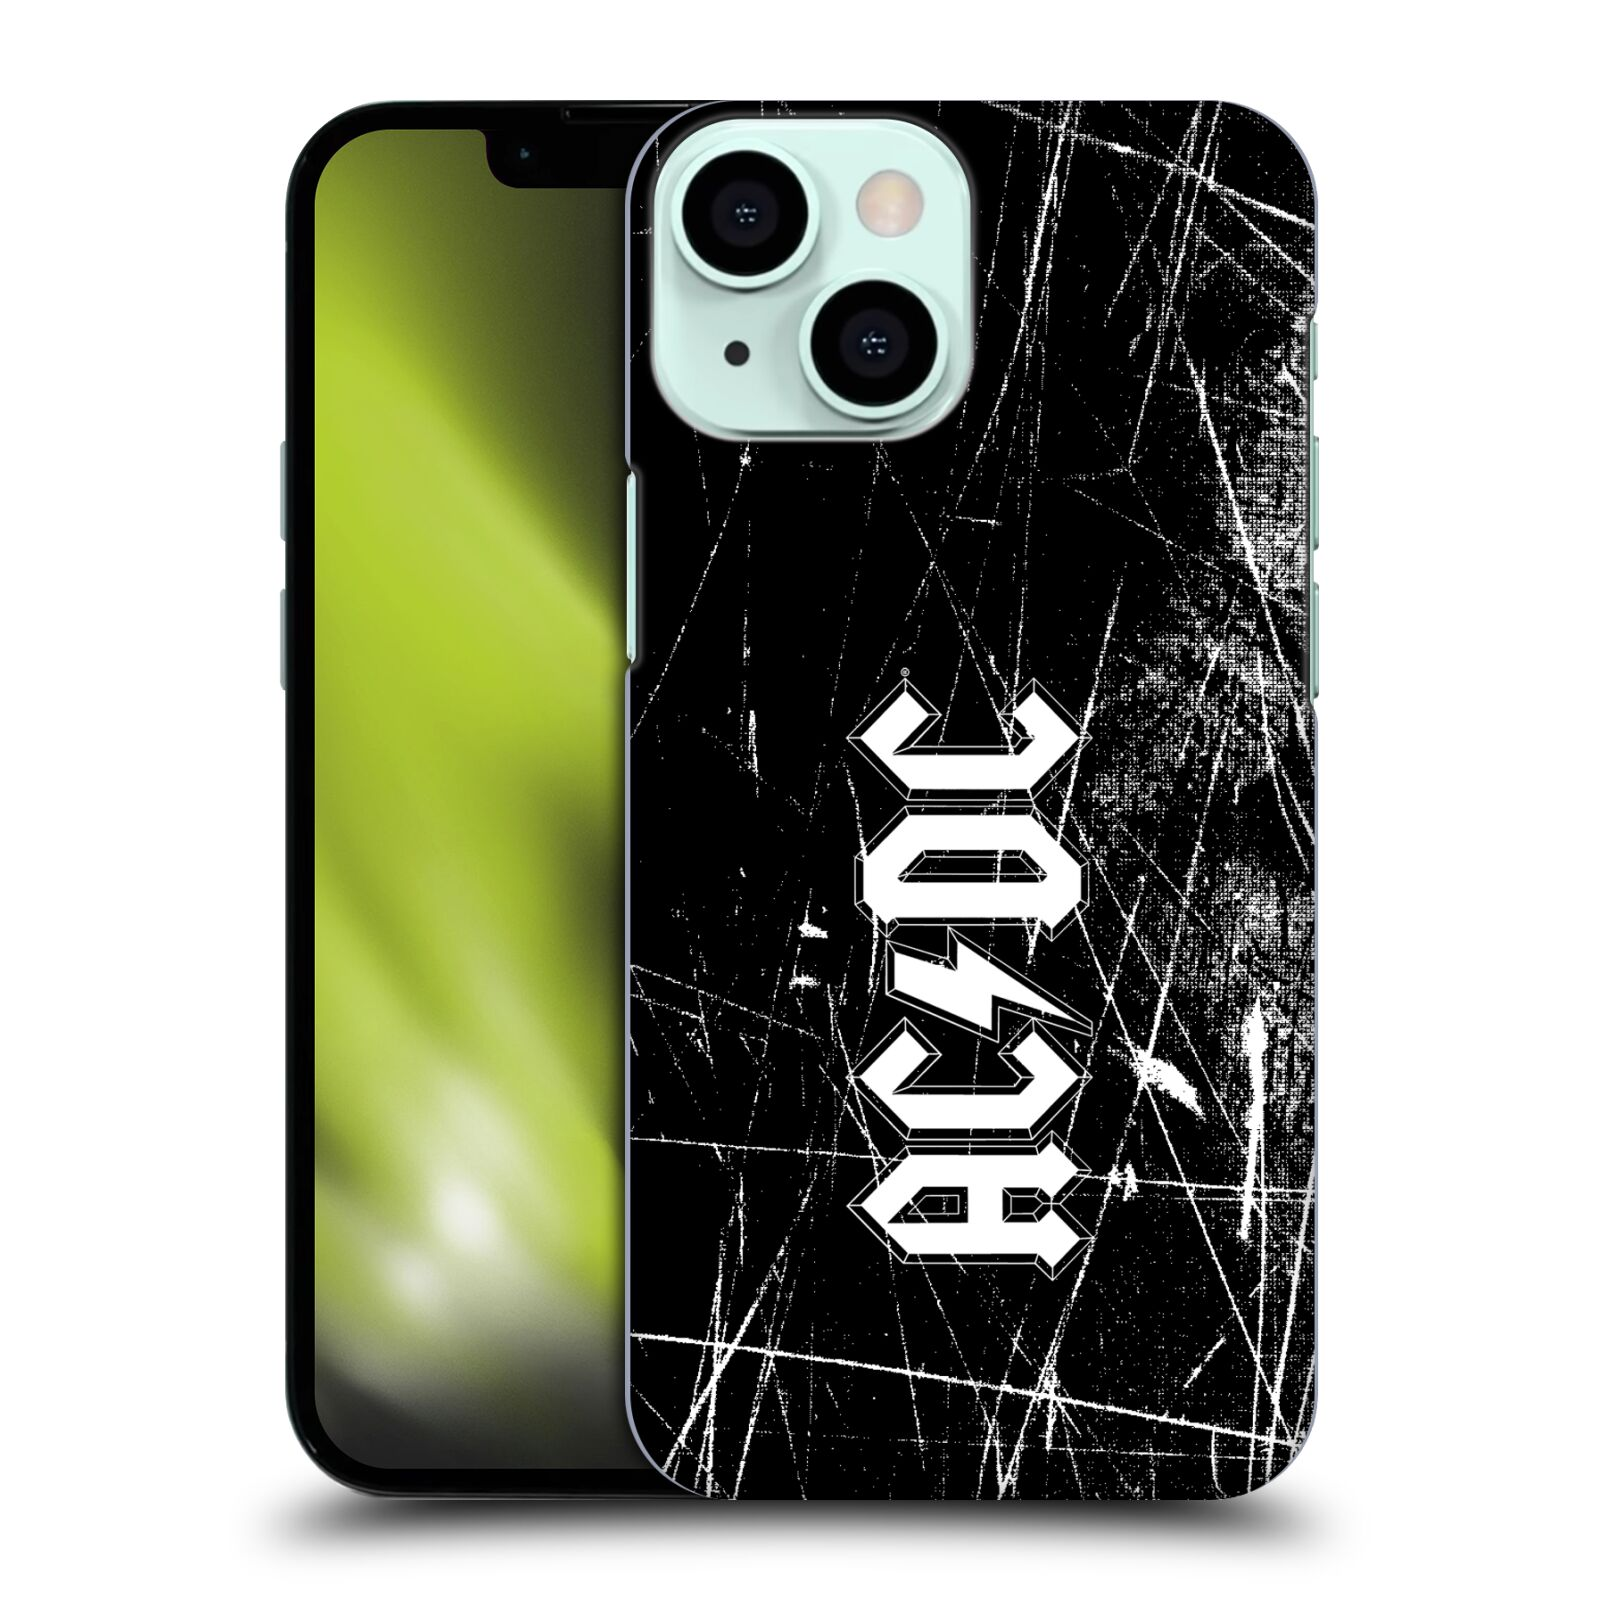 Plastové pouzdro na mobil Apple iPhone 13 Mini - Head Case - AC/DC Černobílé logo